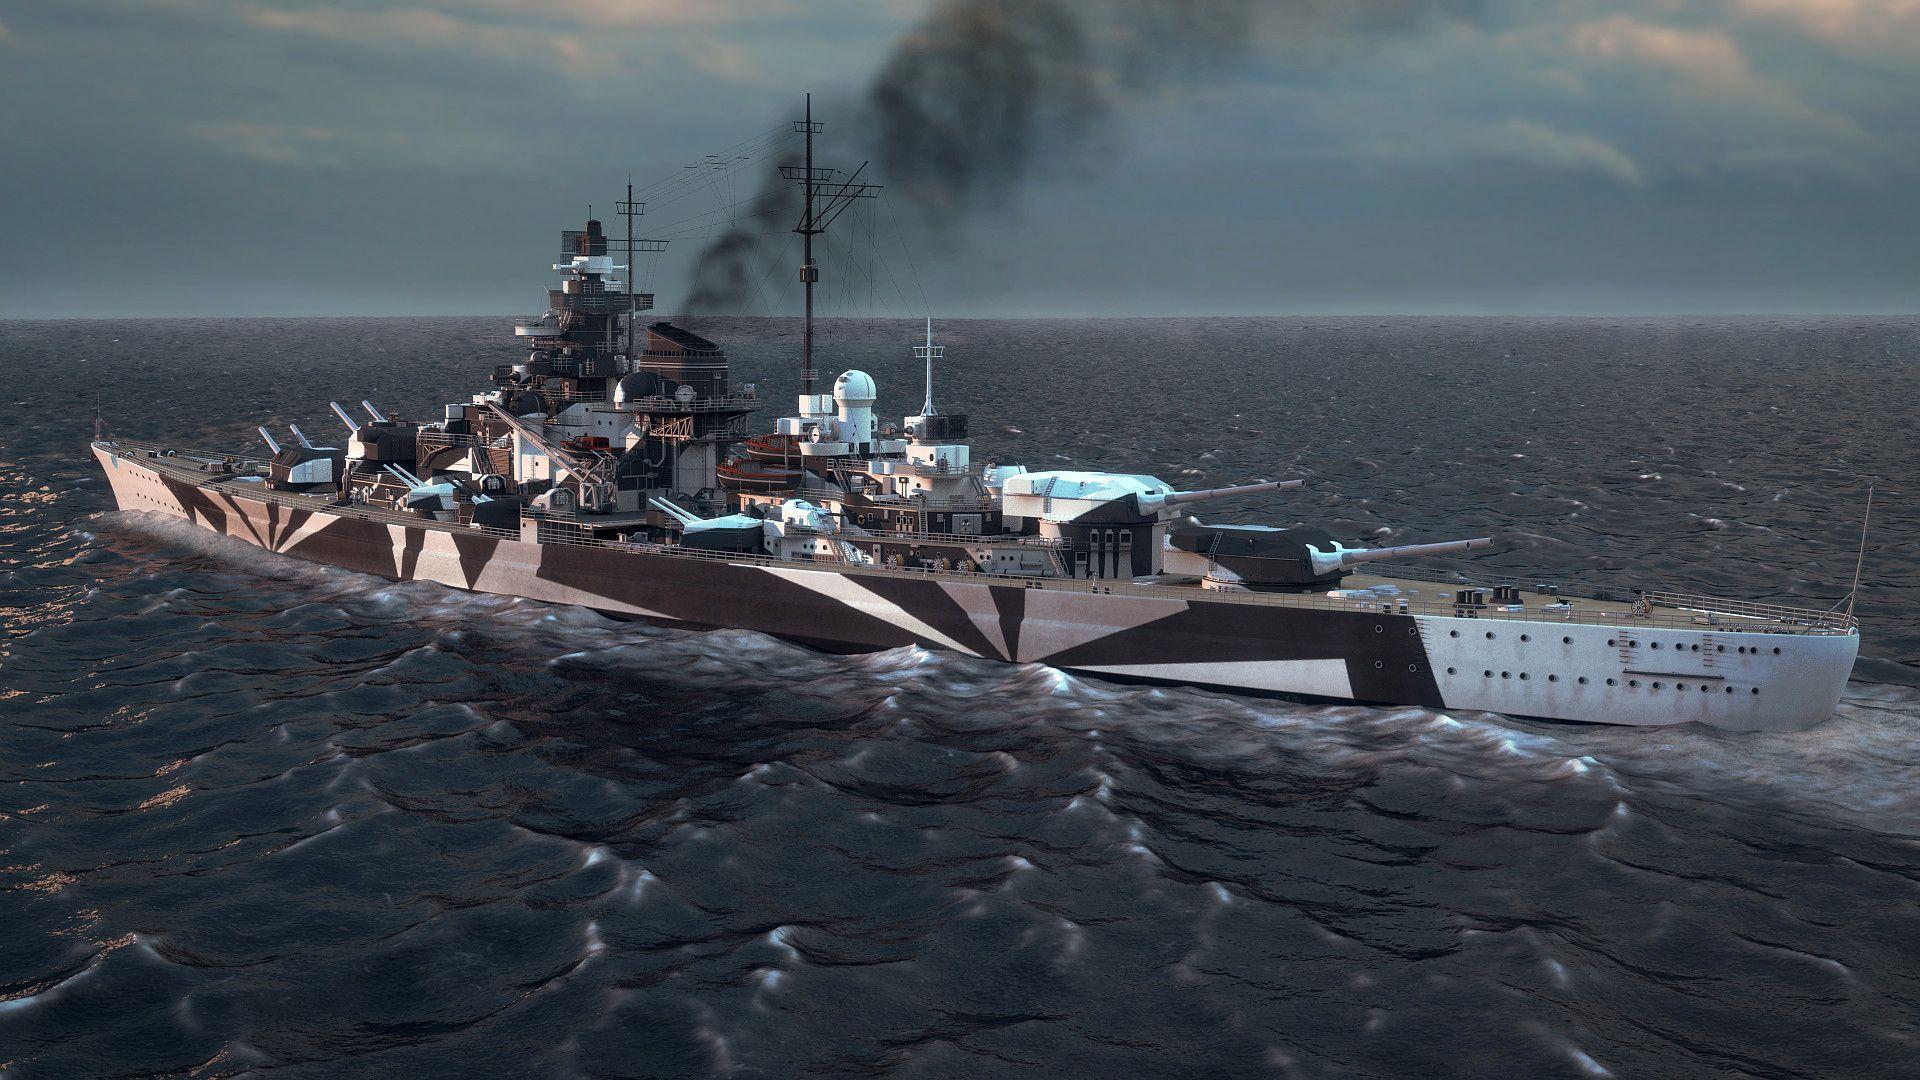 123192-artwork-battleships-history-military-tirpitz-battleship